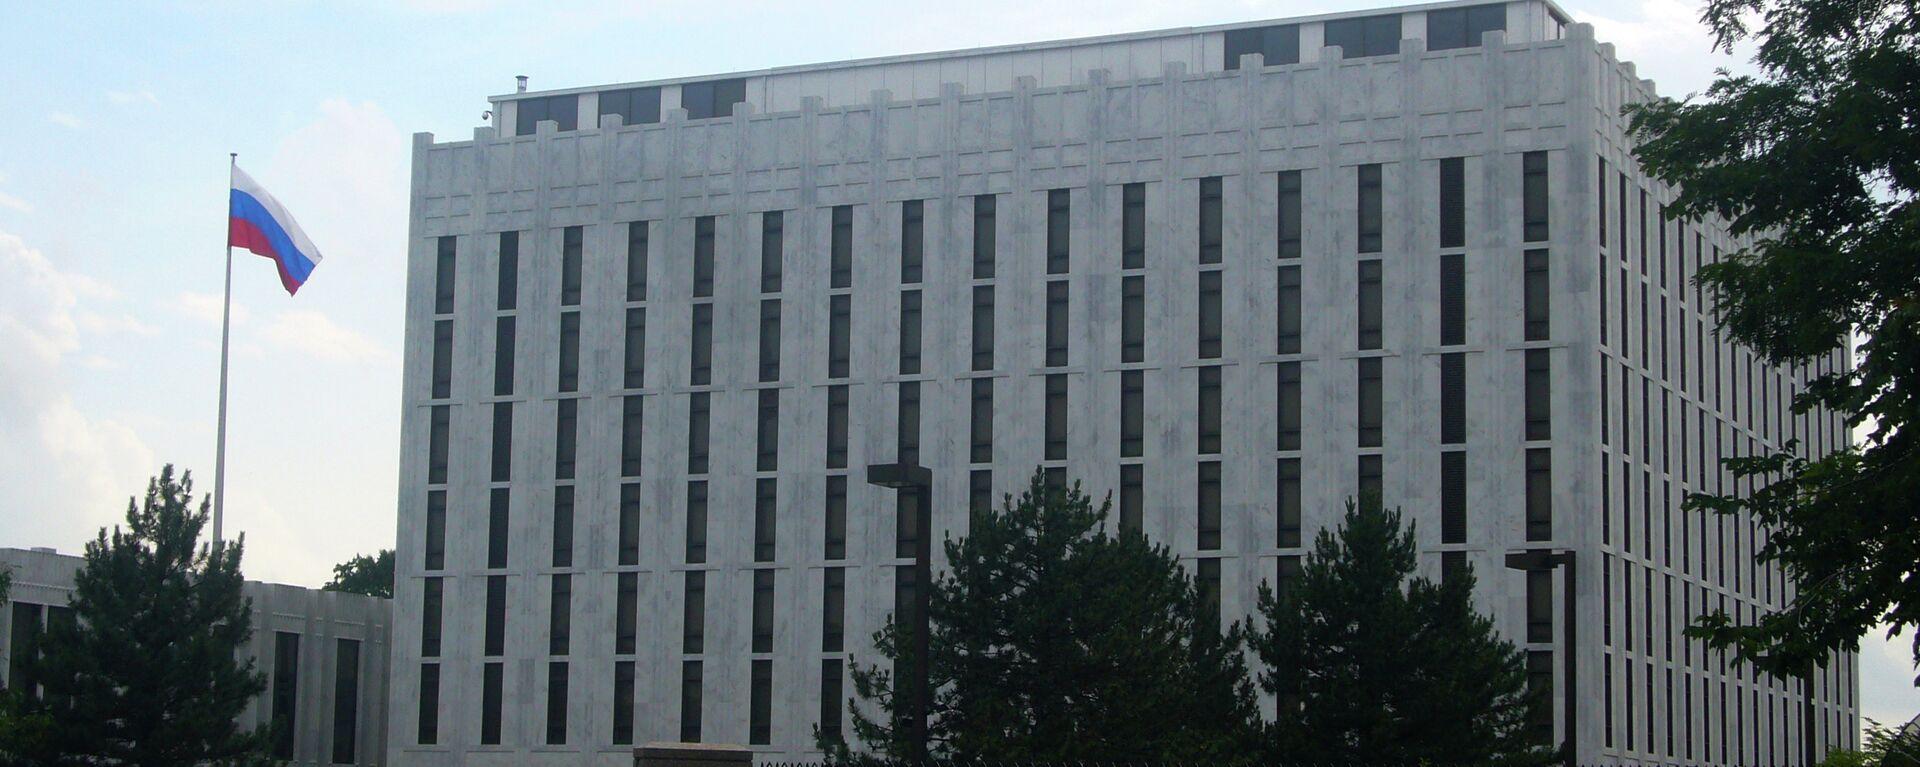 L'ambasciata russa a Washington, USA. - Sputnik Italia, 1920, 25.02.2020